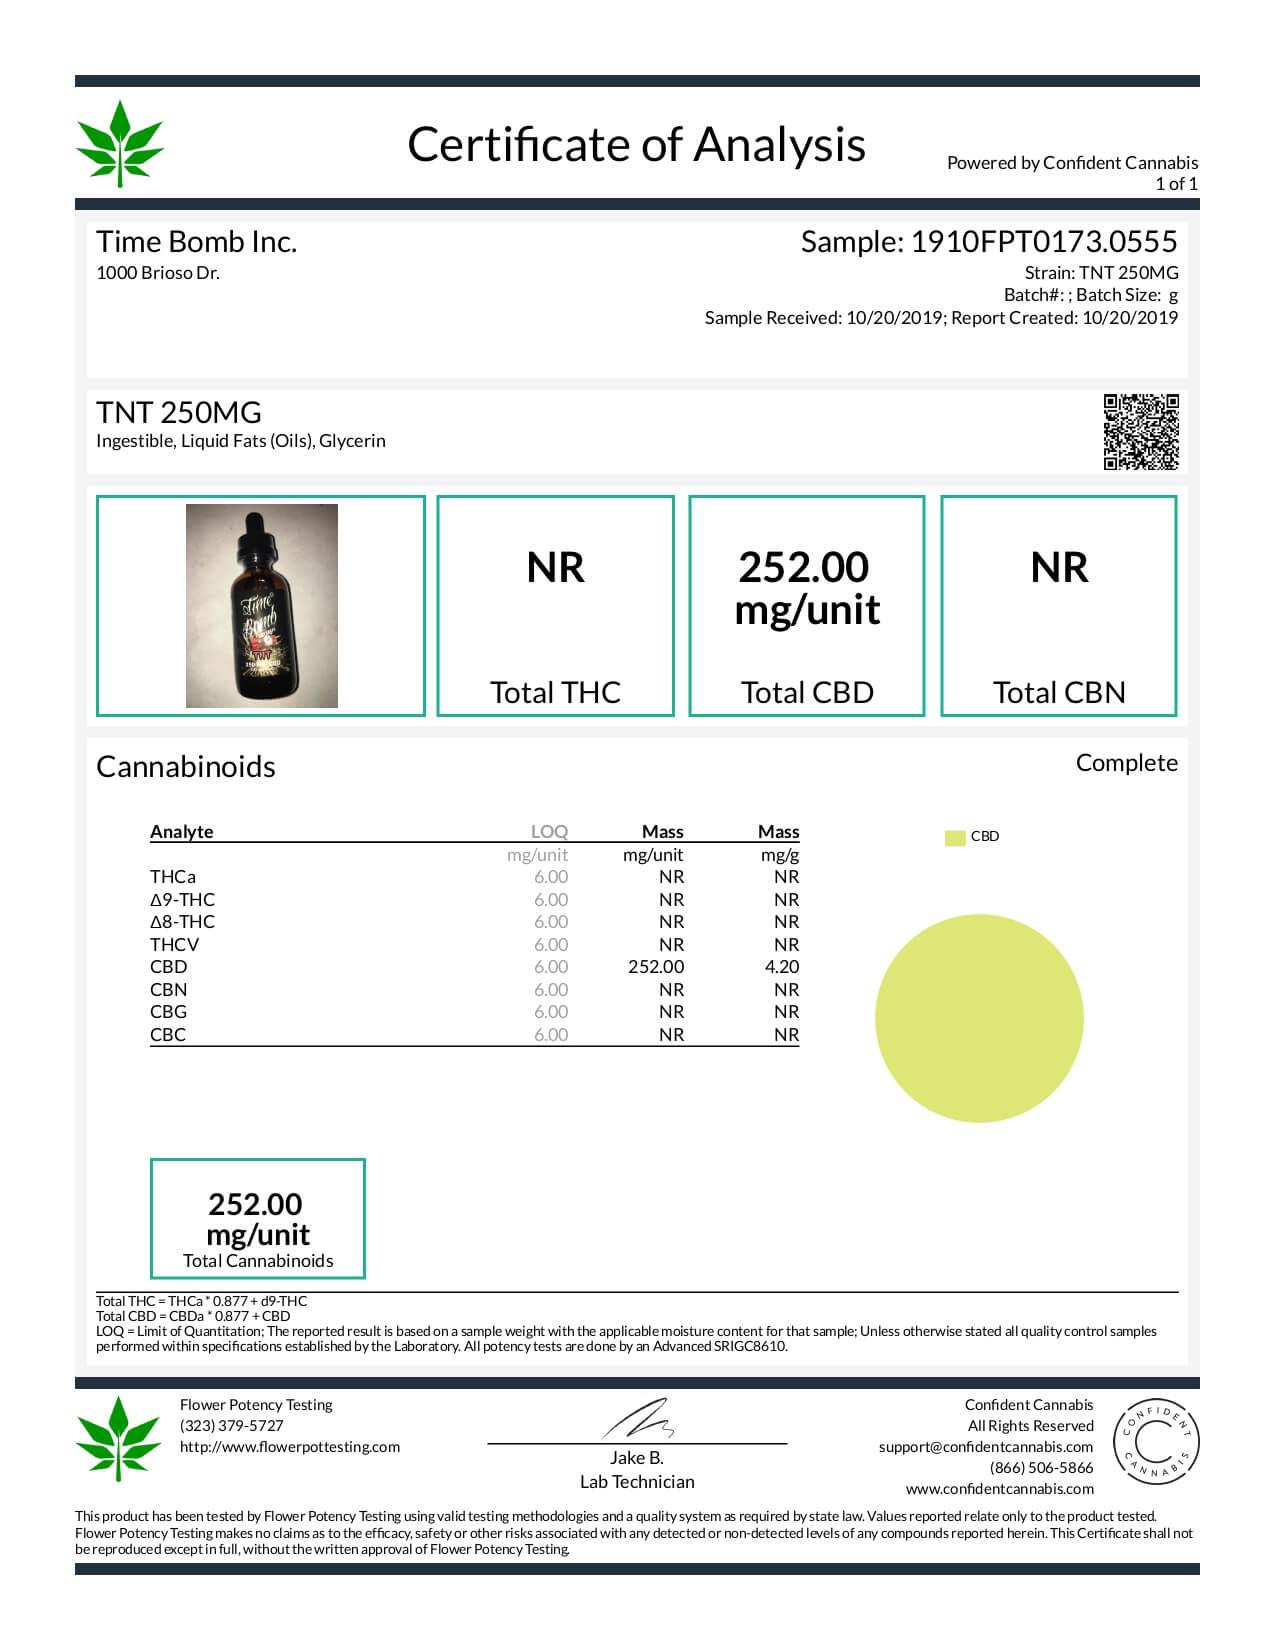 Time Bomb Extracts CBD Vape Juice TNT 250mg Lab Report